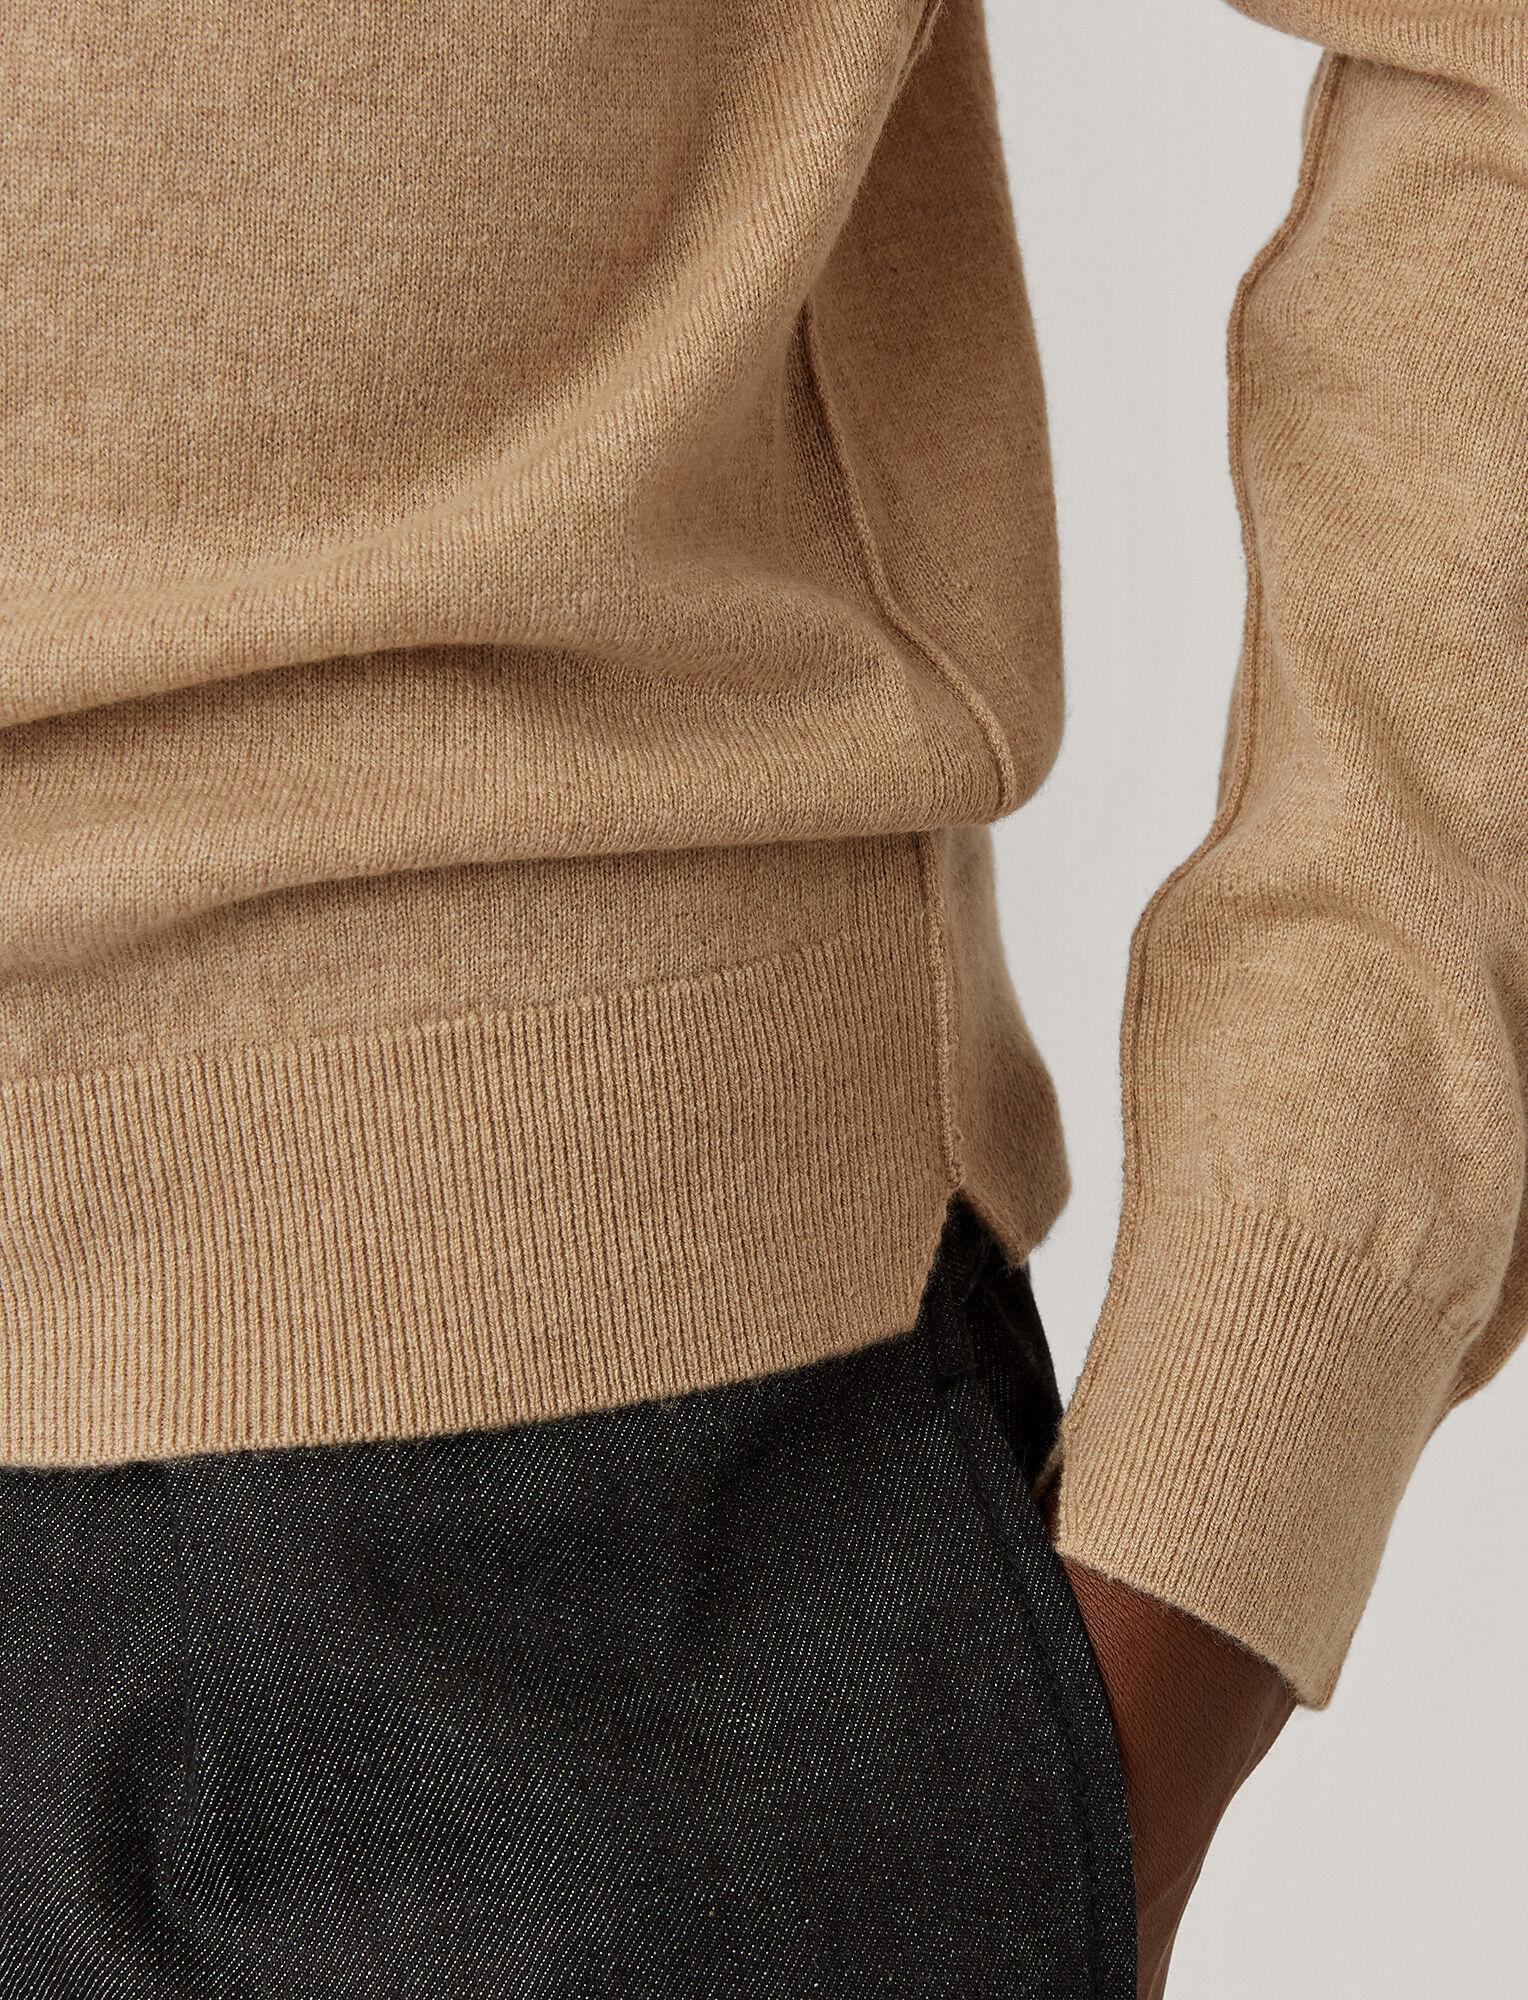 Joseph, Roll Neck Cashmere Knit, in Beige